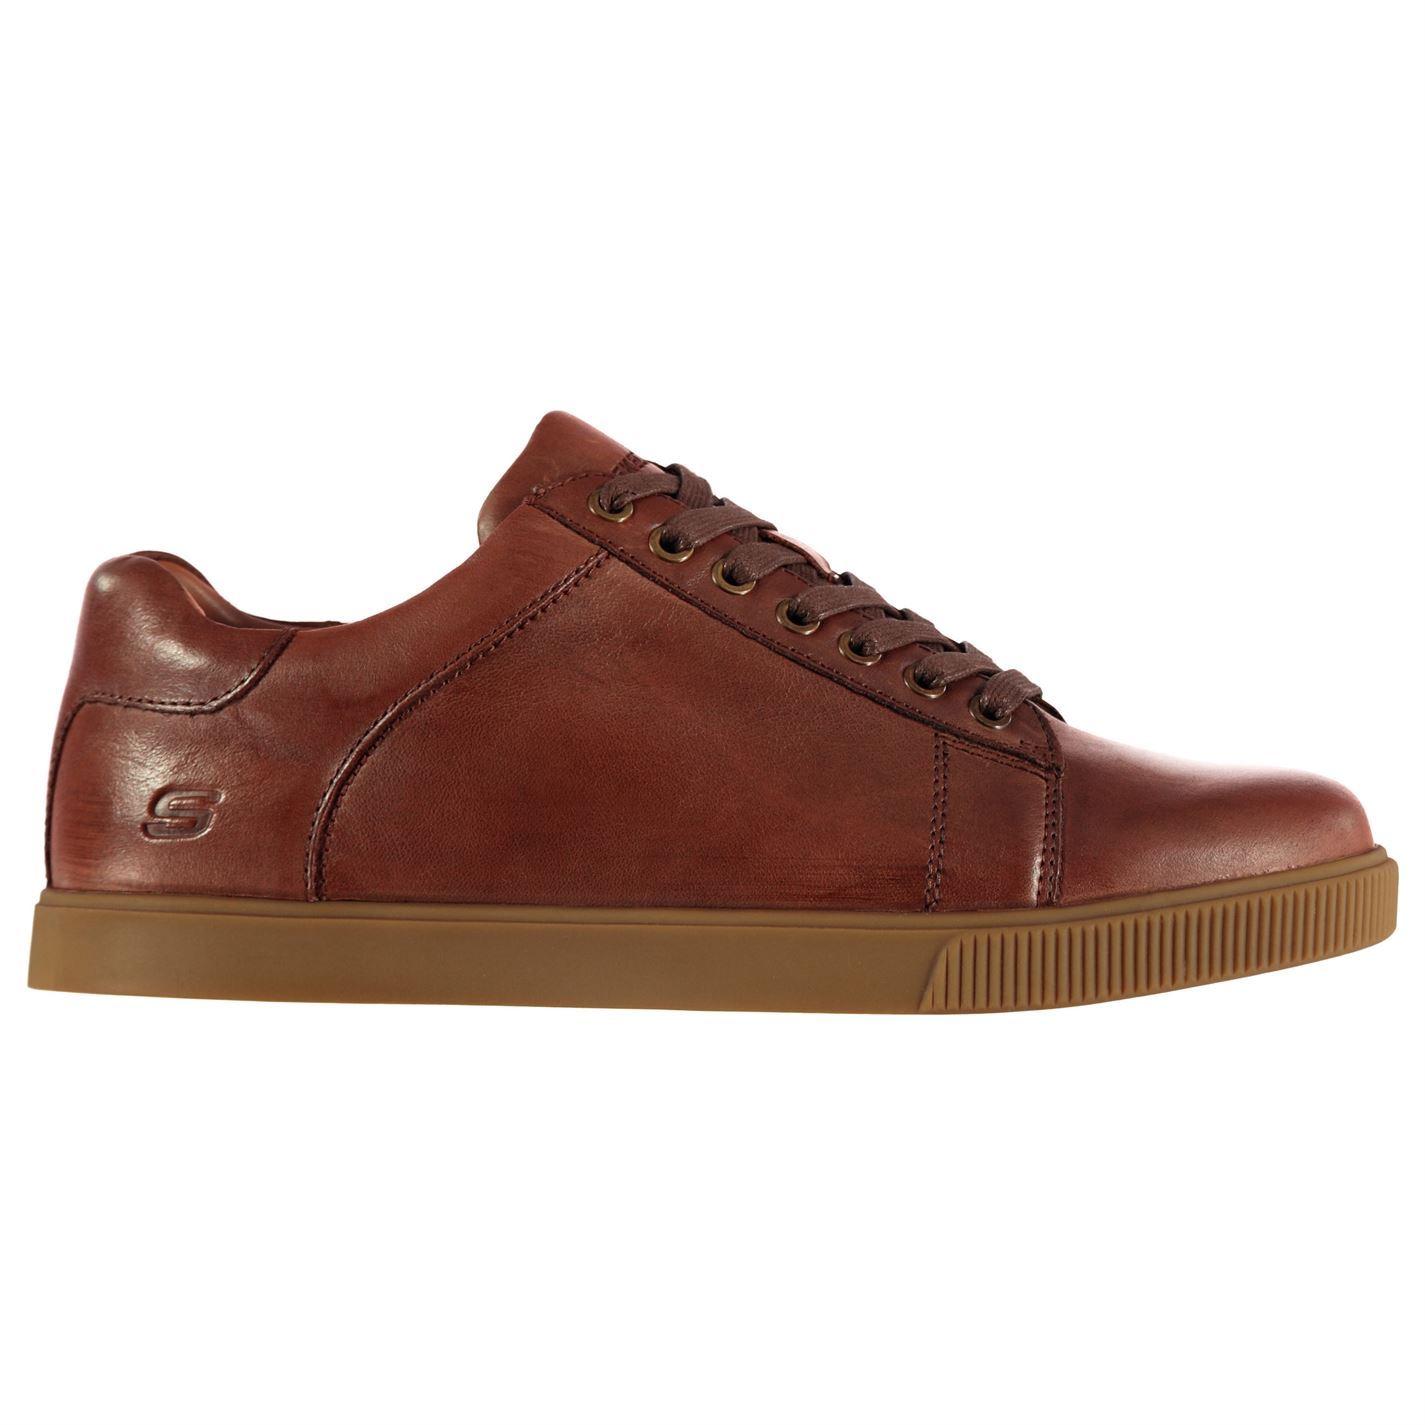 Skechers-Vol-Fandom-Homme-Chaussures-Baskets-decontractees-chaussures-baskets miniature 14